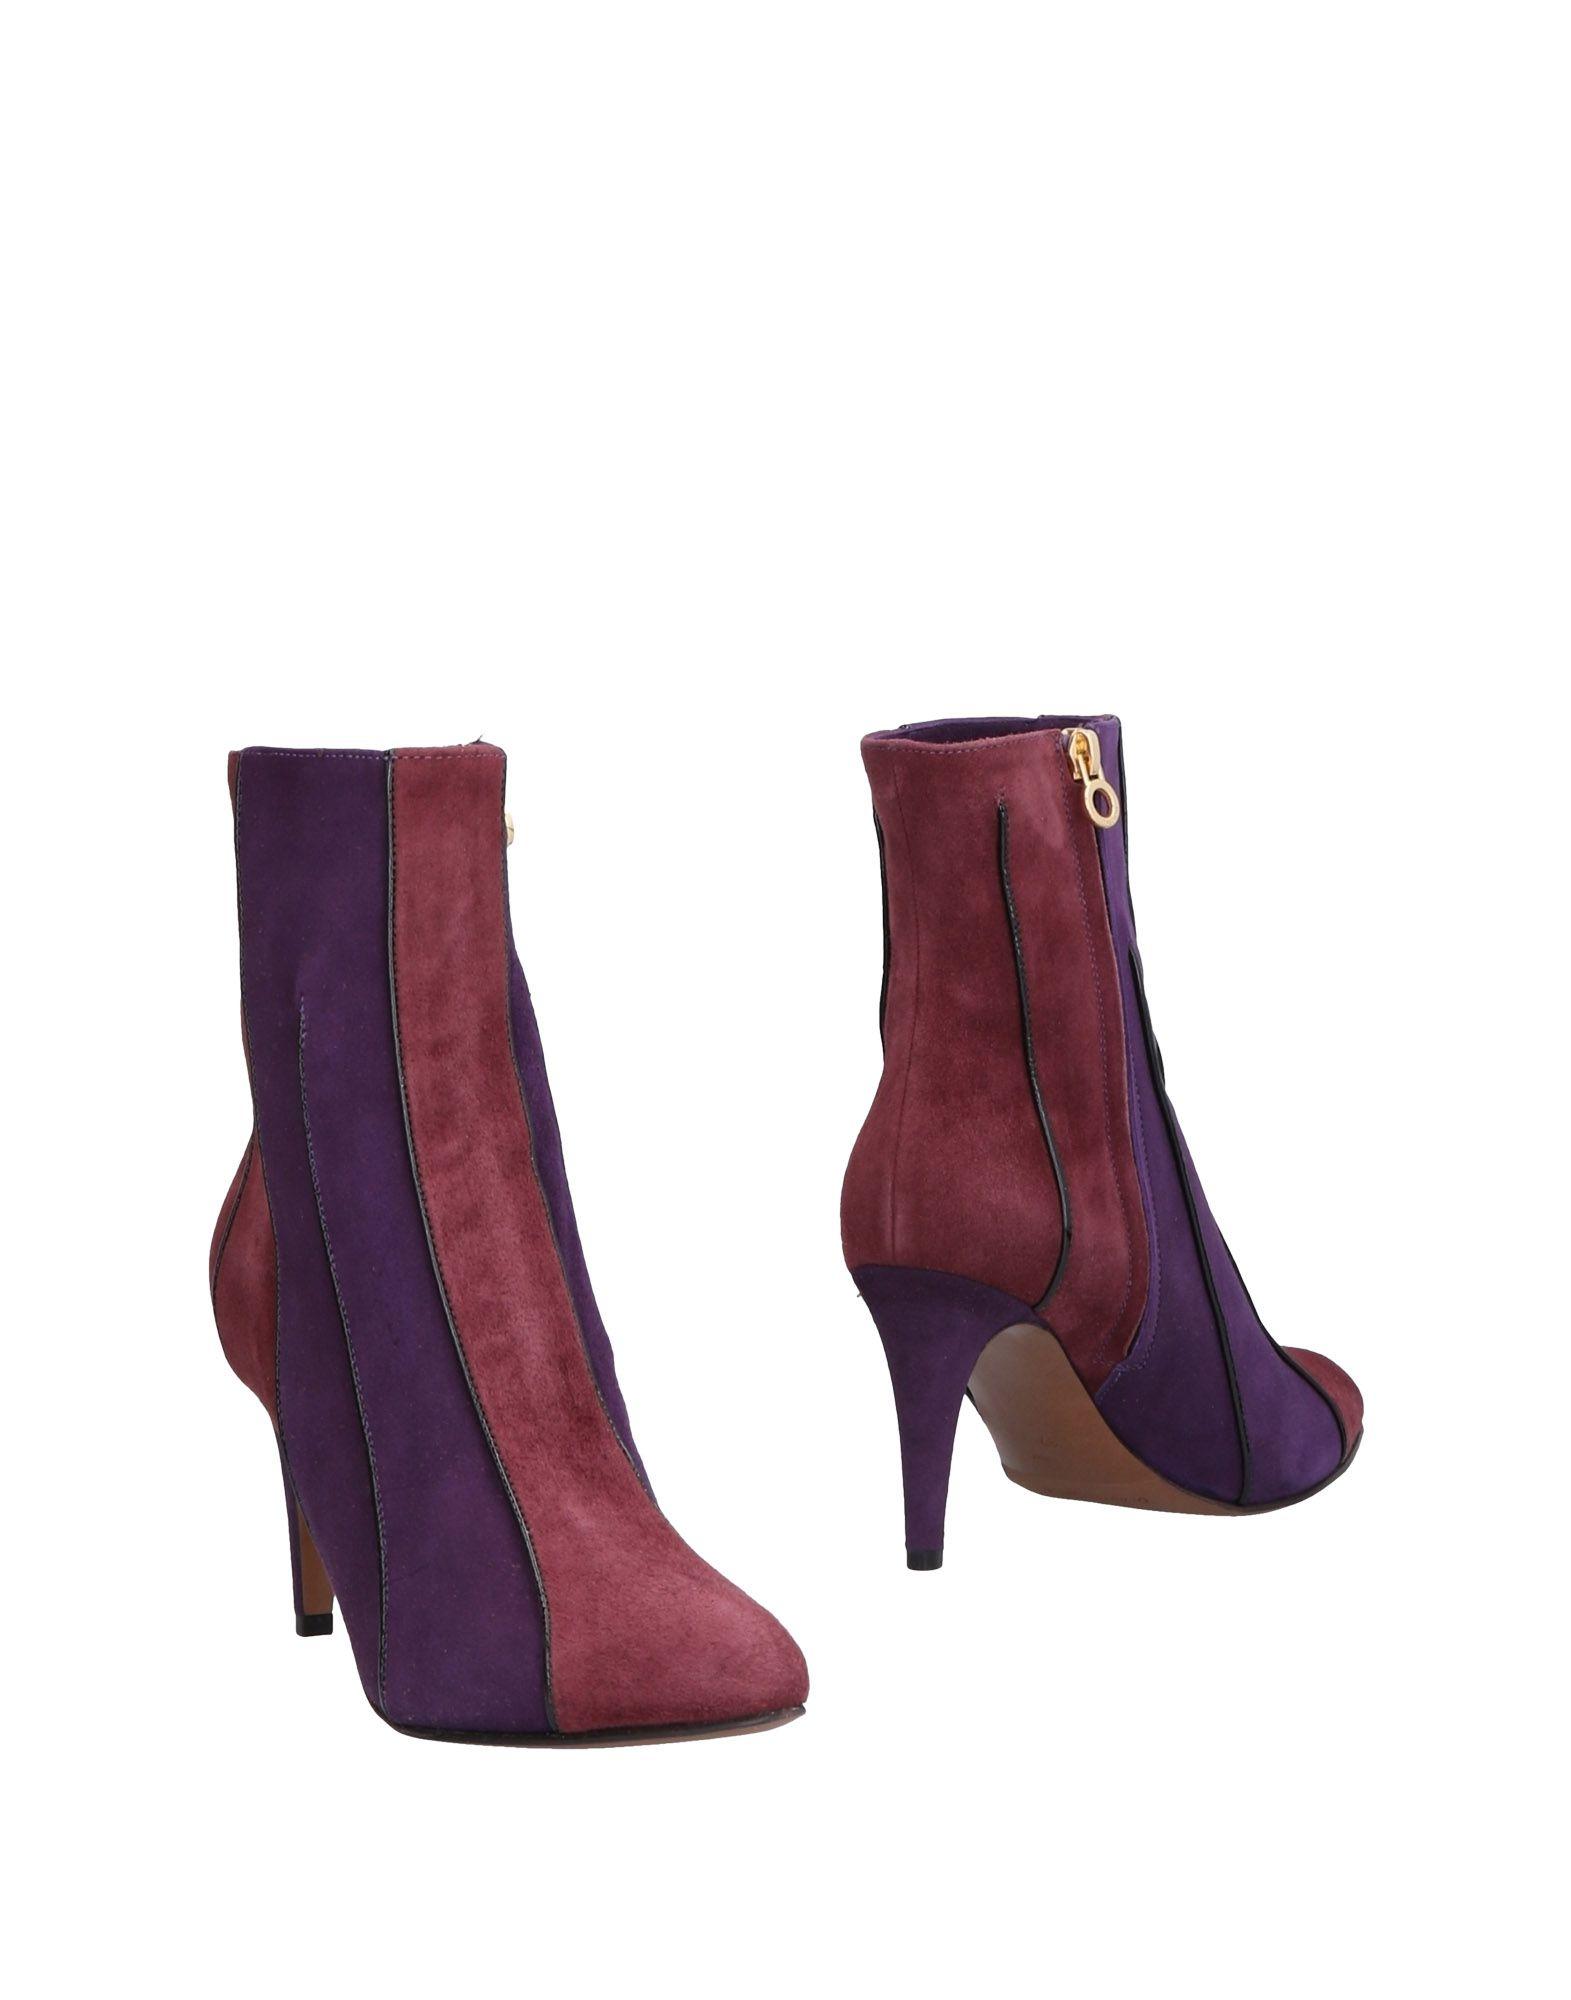 Rabatt Schuhe L' Autre Chose Stiefelette Damen  11460345SD